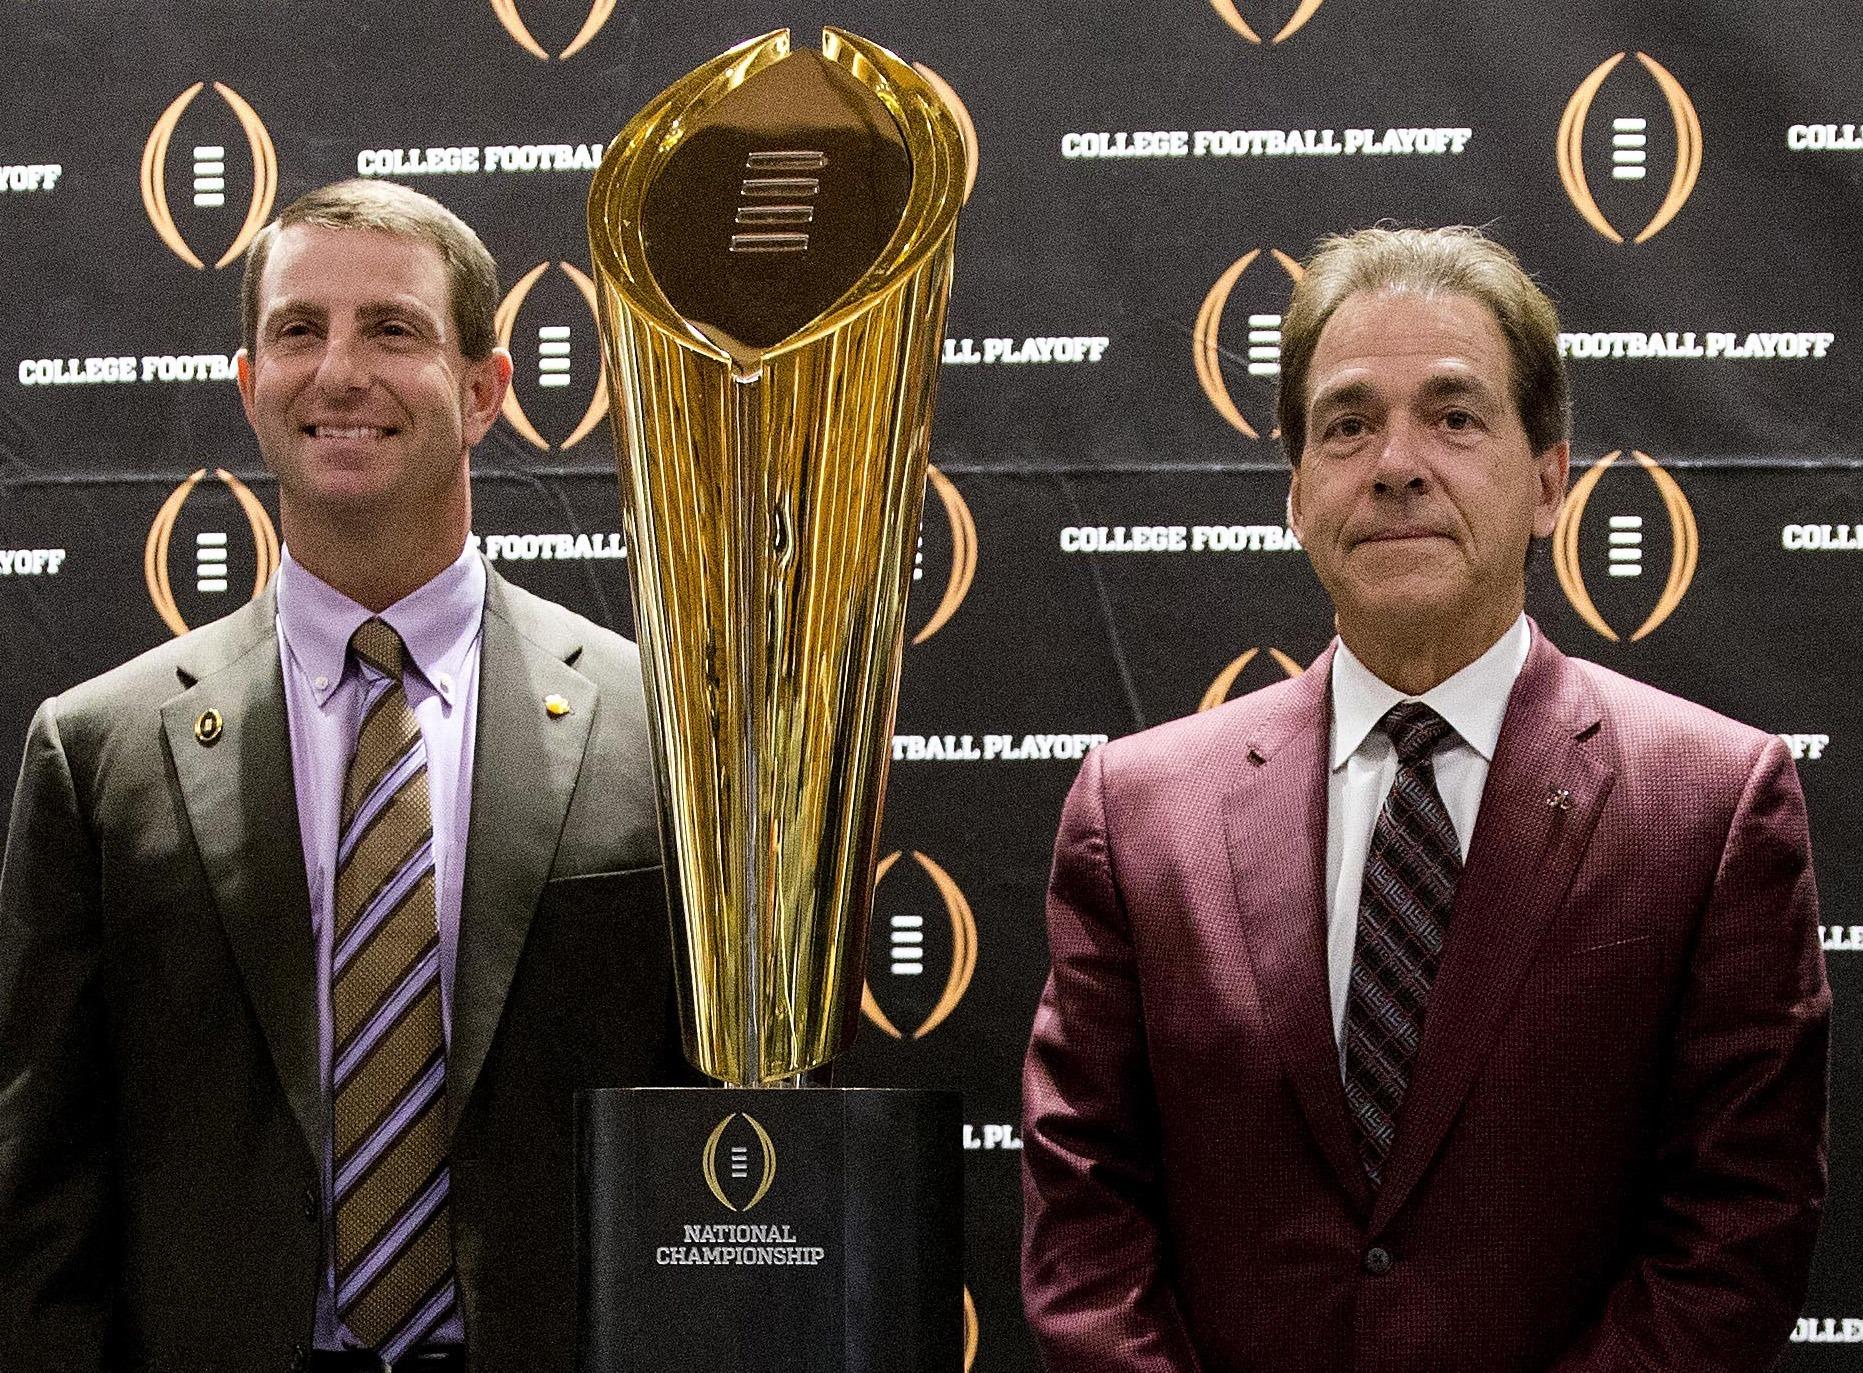 Clemson underdog Alabama CFP National Championship